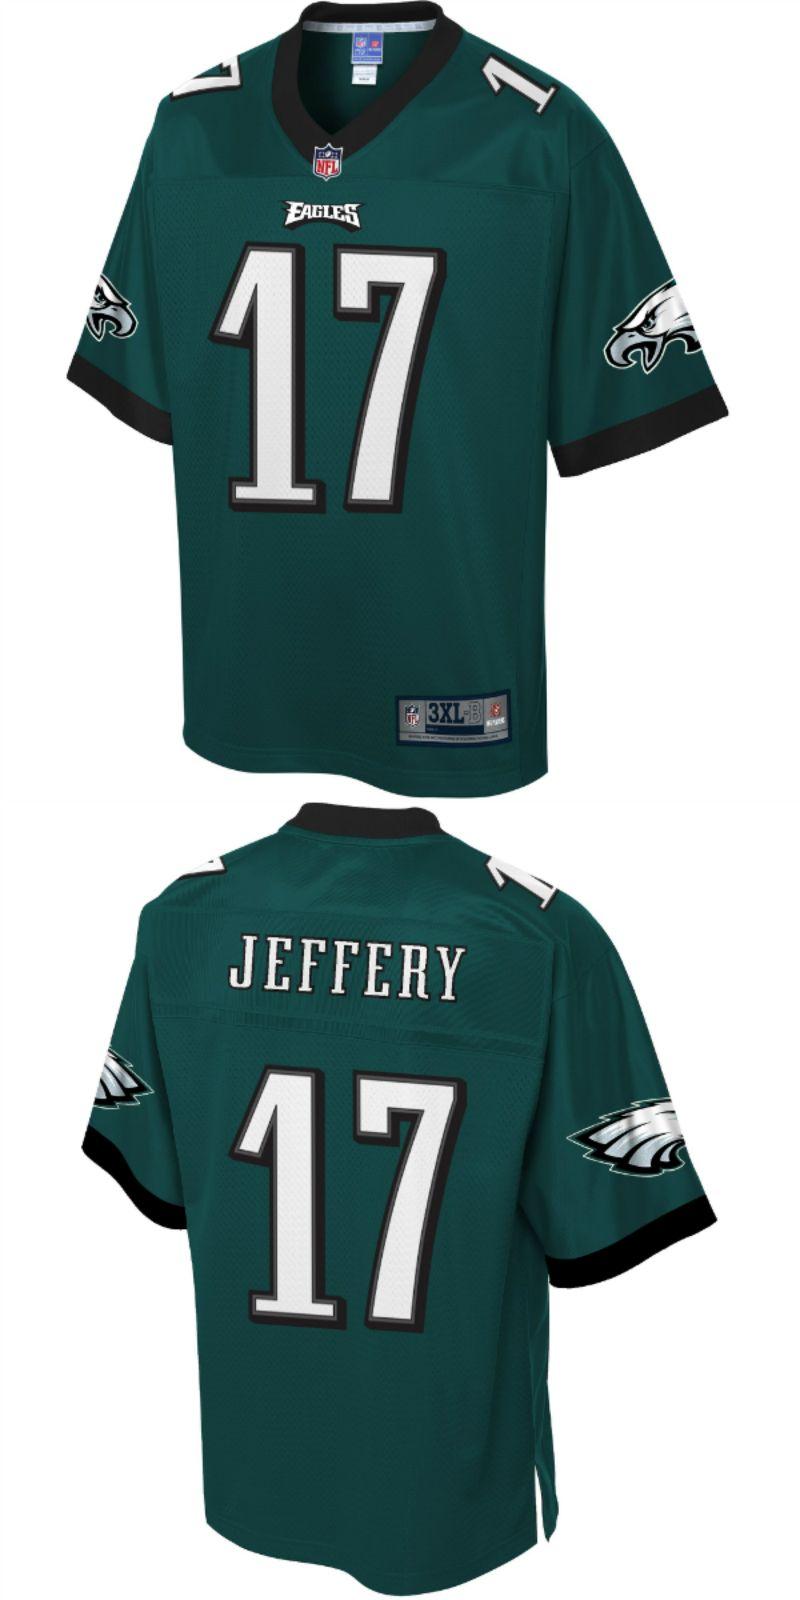 8fe515a0 UP TO 70% OFF. Alshon Jeffery Philadelphia Eagles NFL Pro Line Big ...